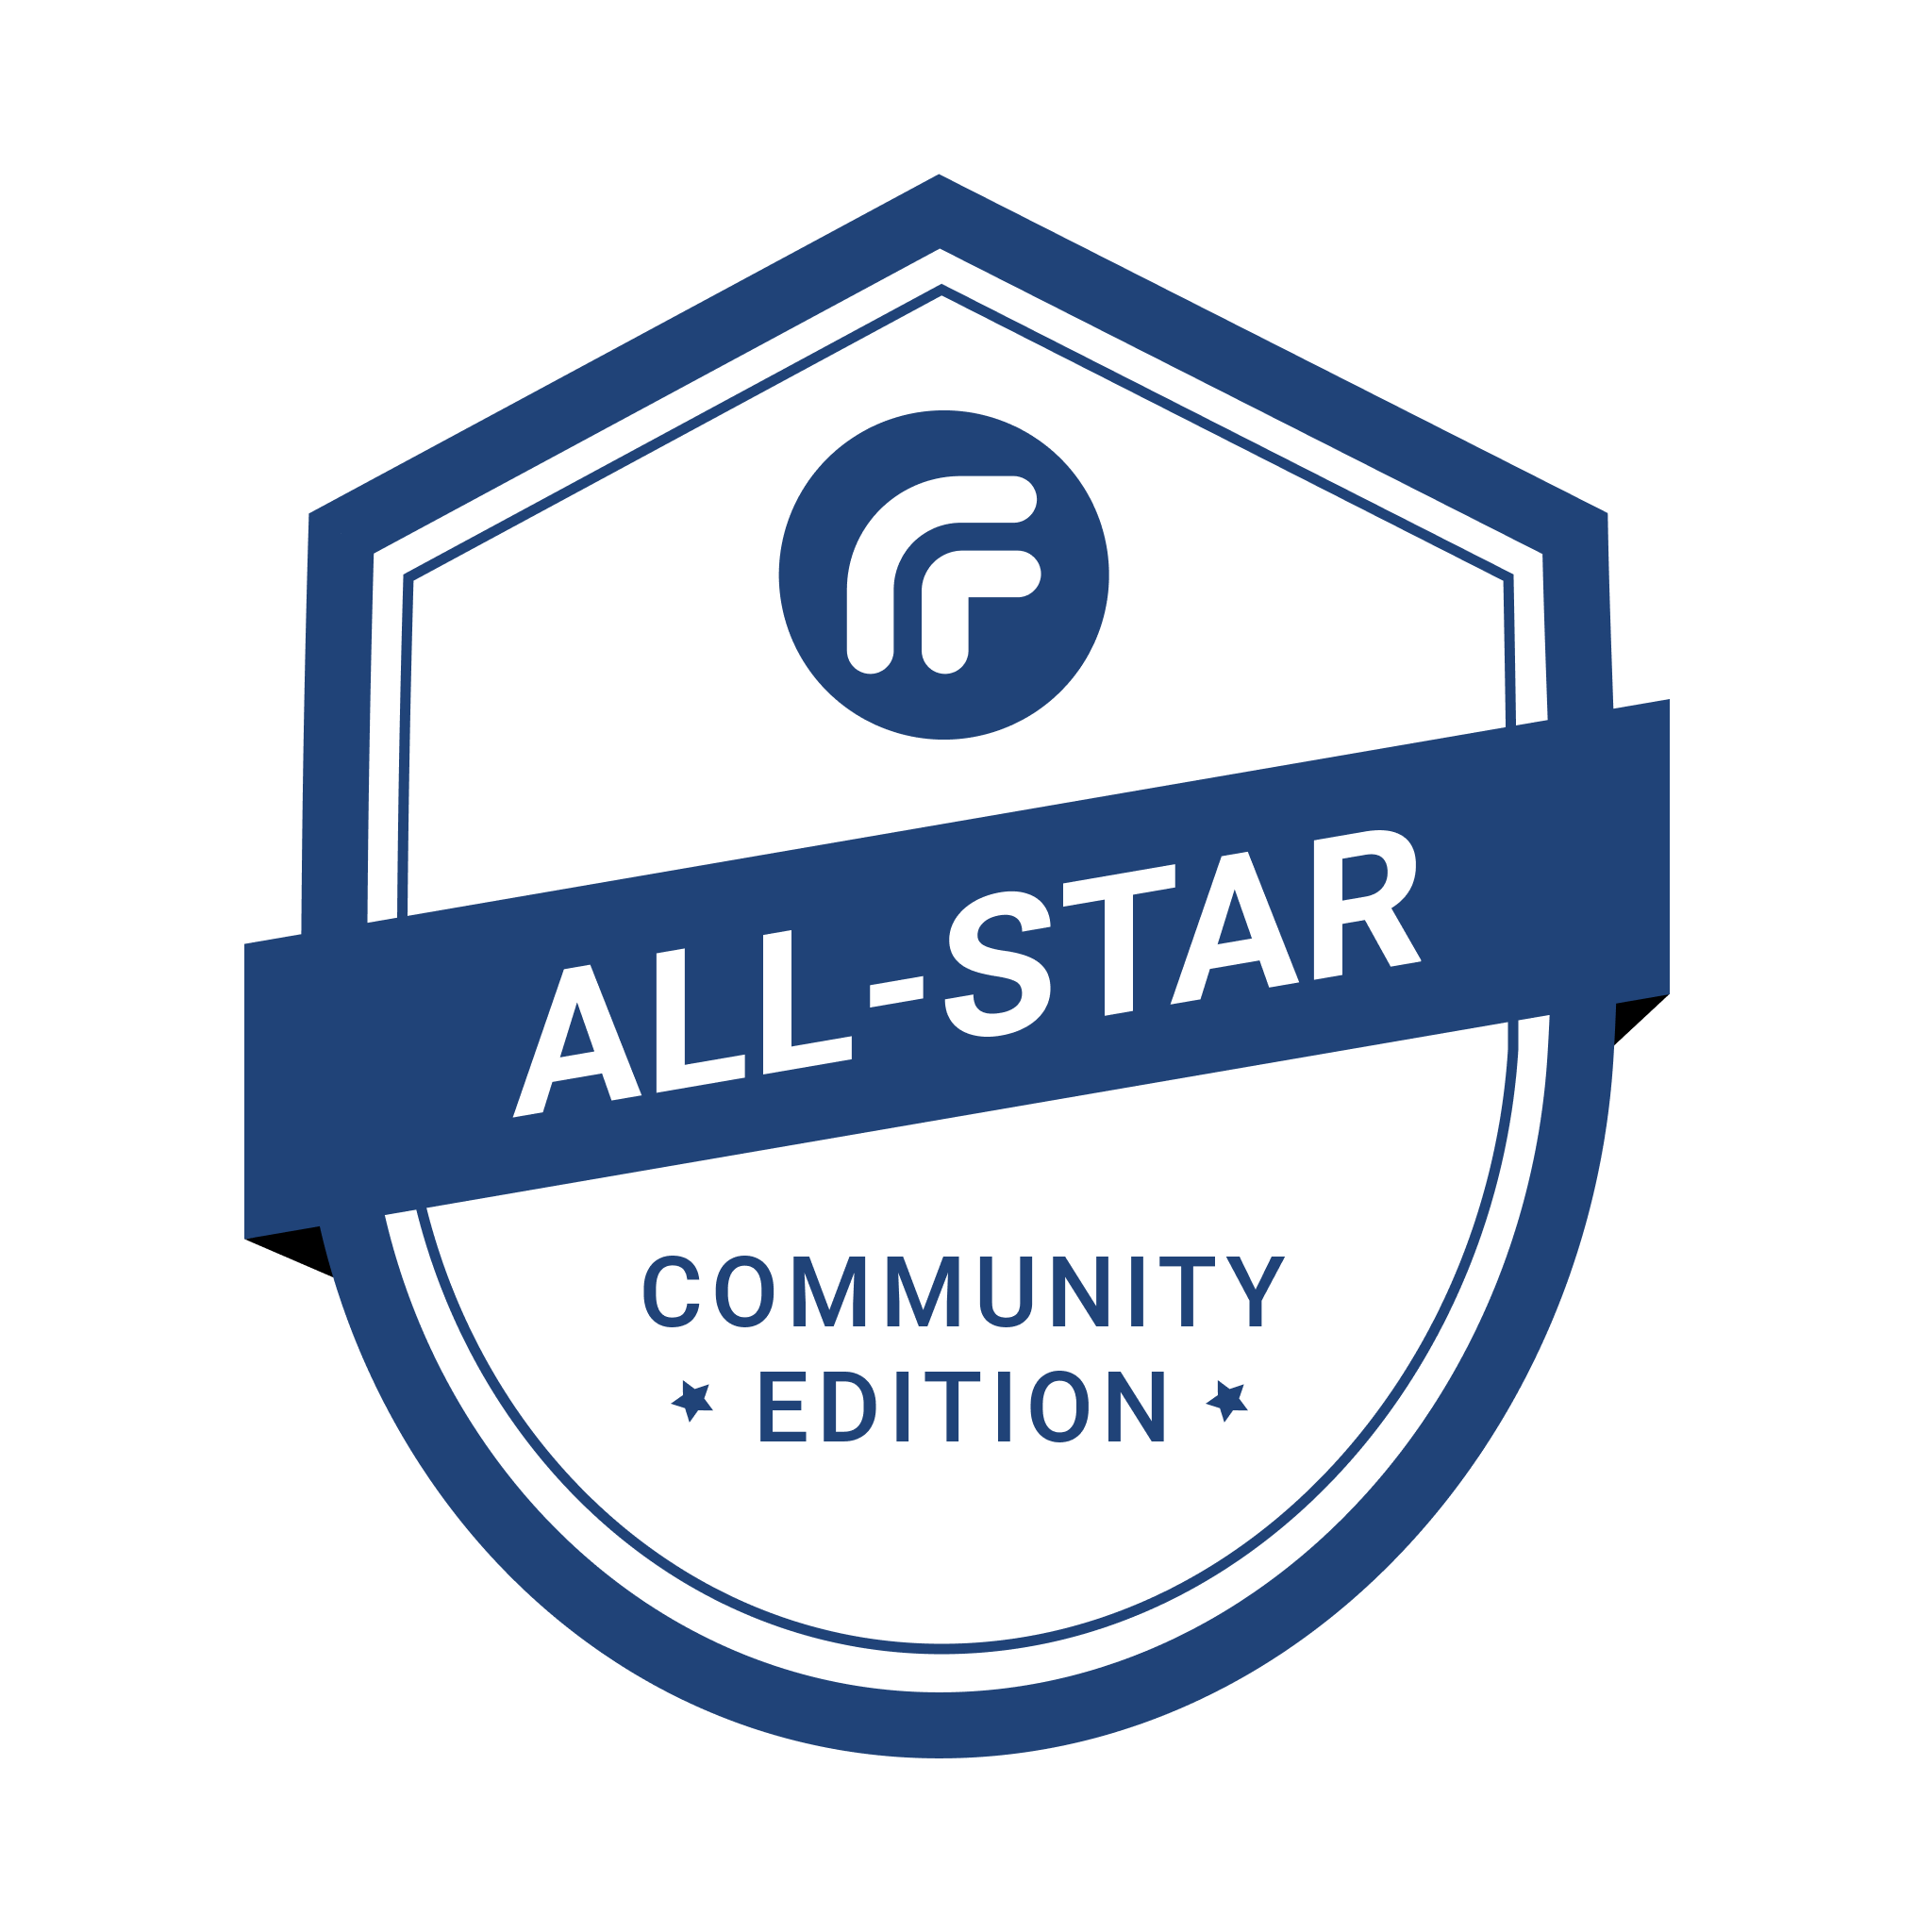 RangeForce Community Edition All-Star